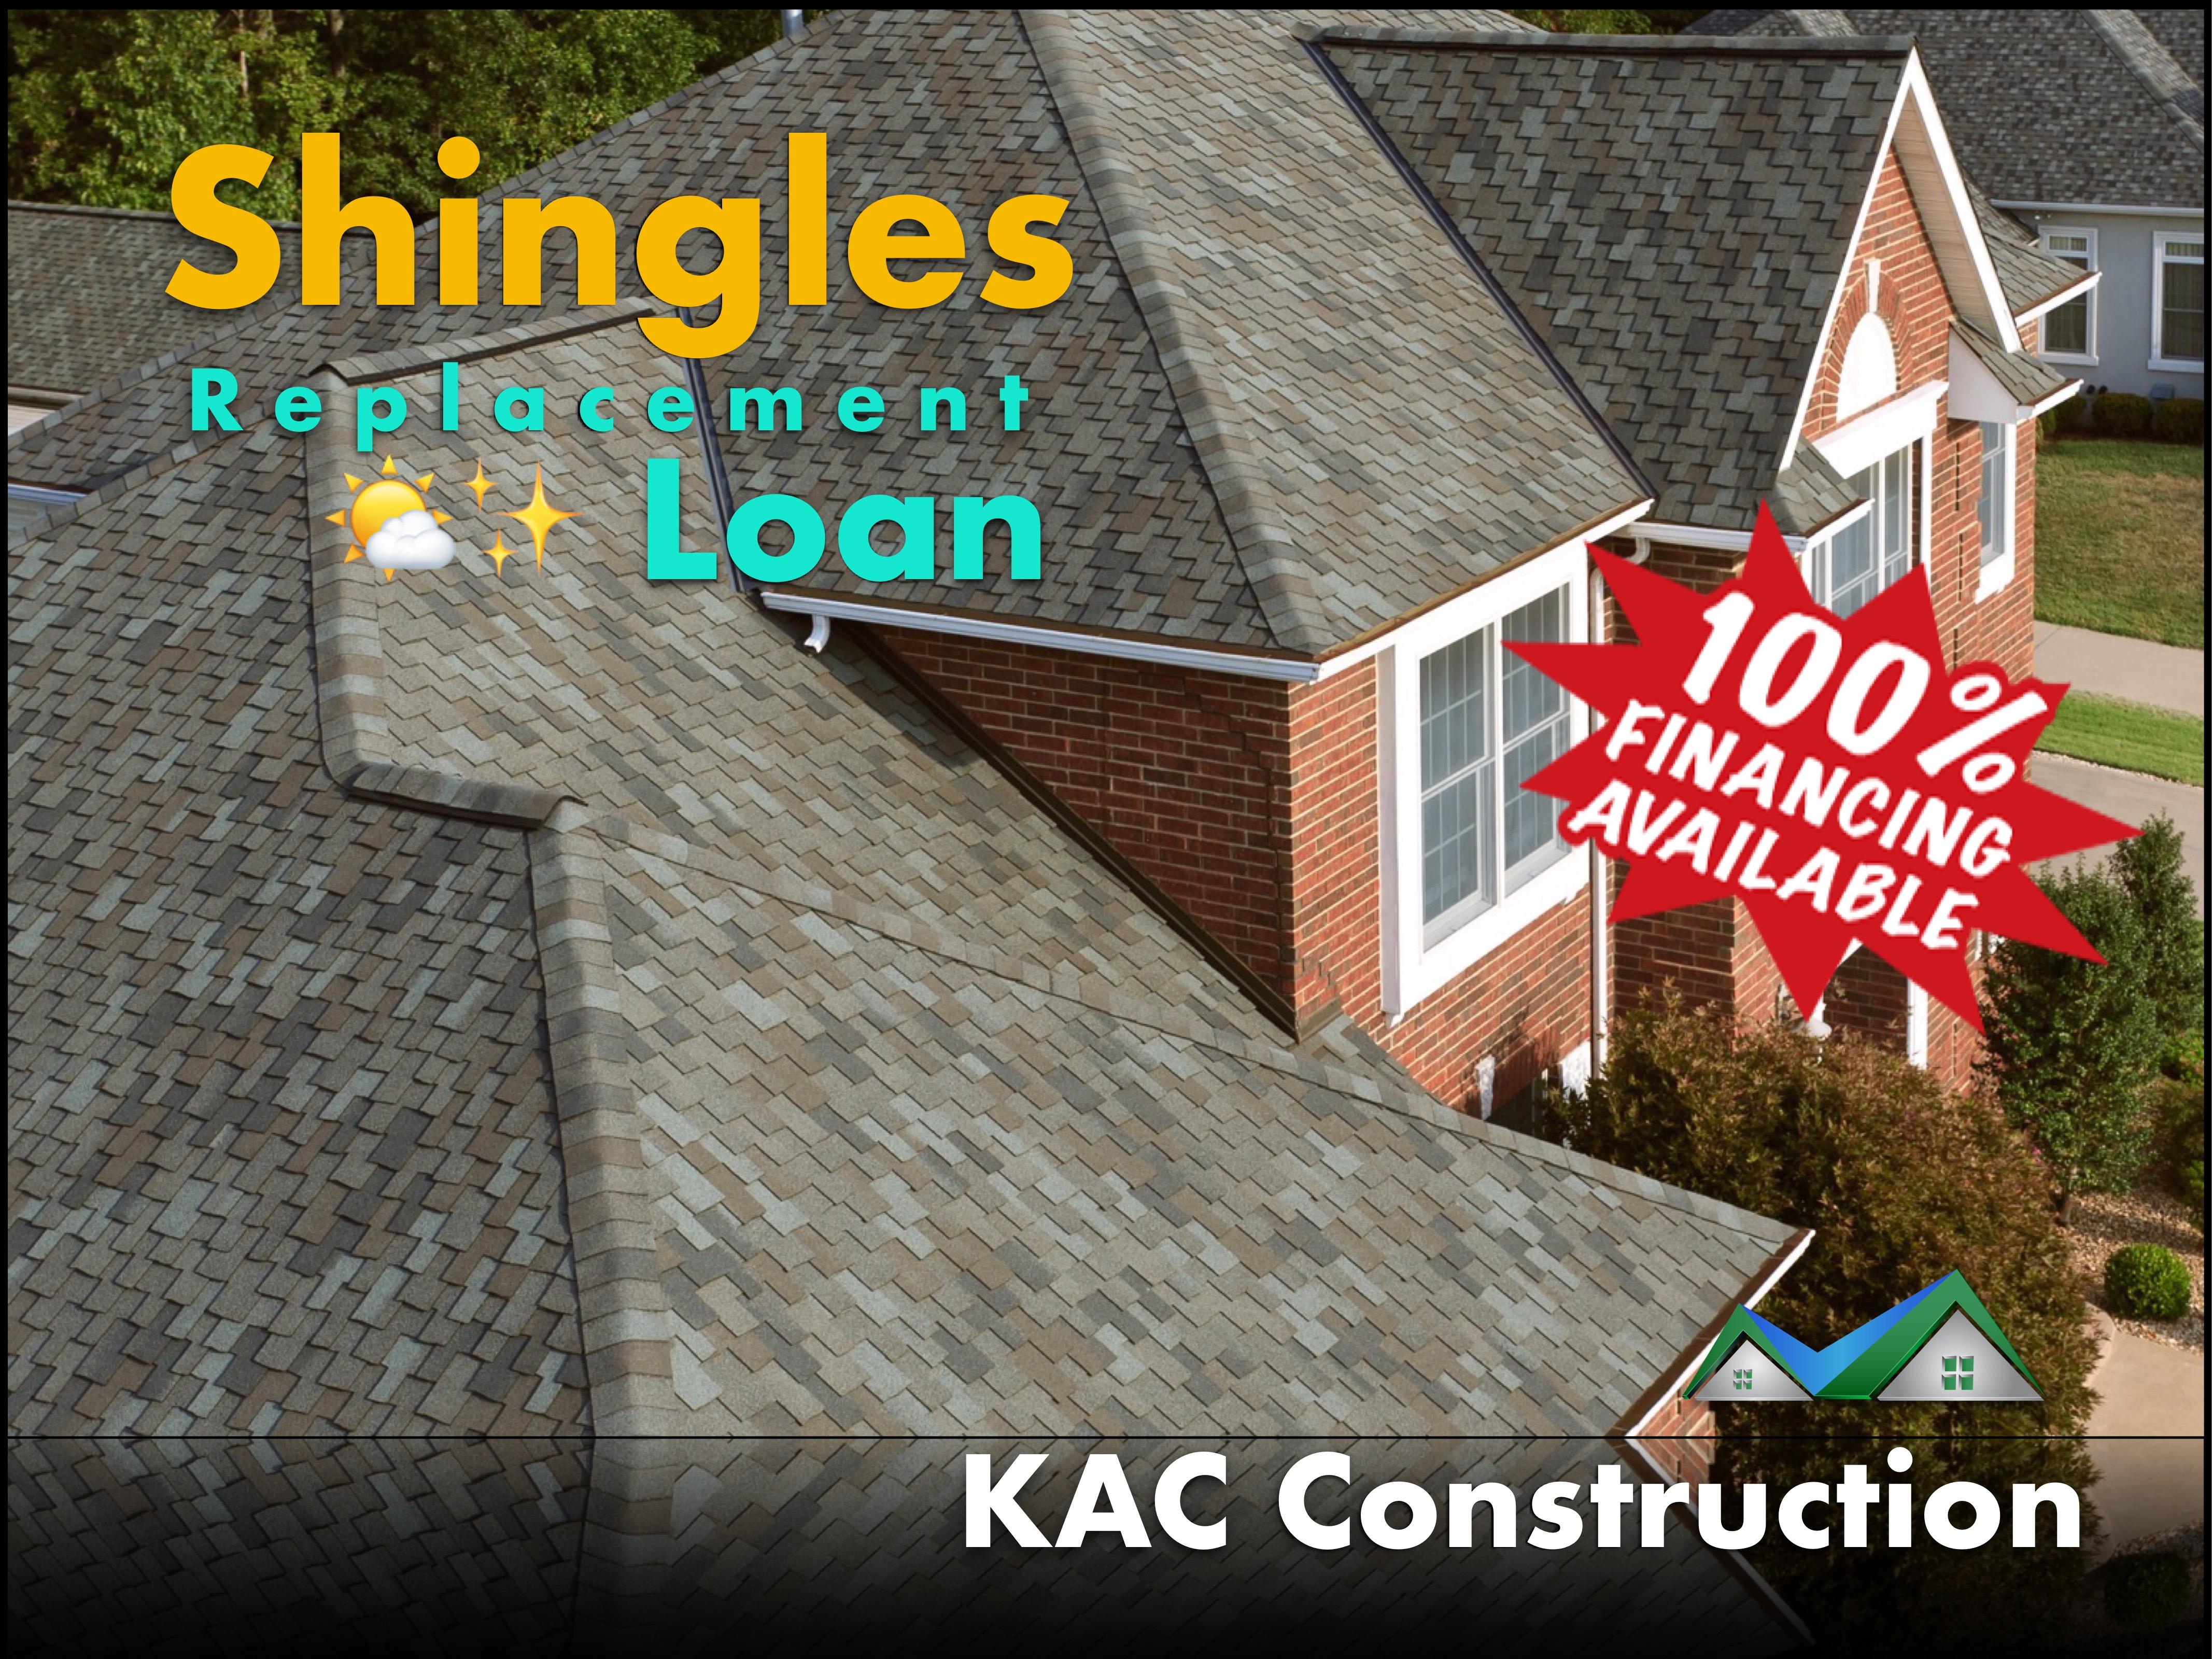 Best roof, best roof ri, best roof in ri, best roof cranston, best roof cranston ri, best roof in cranston, best roof in cranston ri